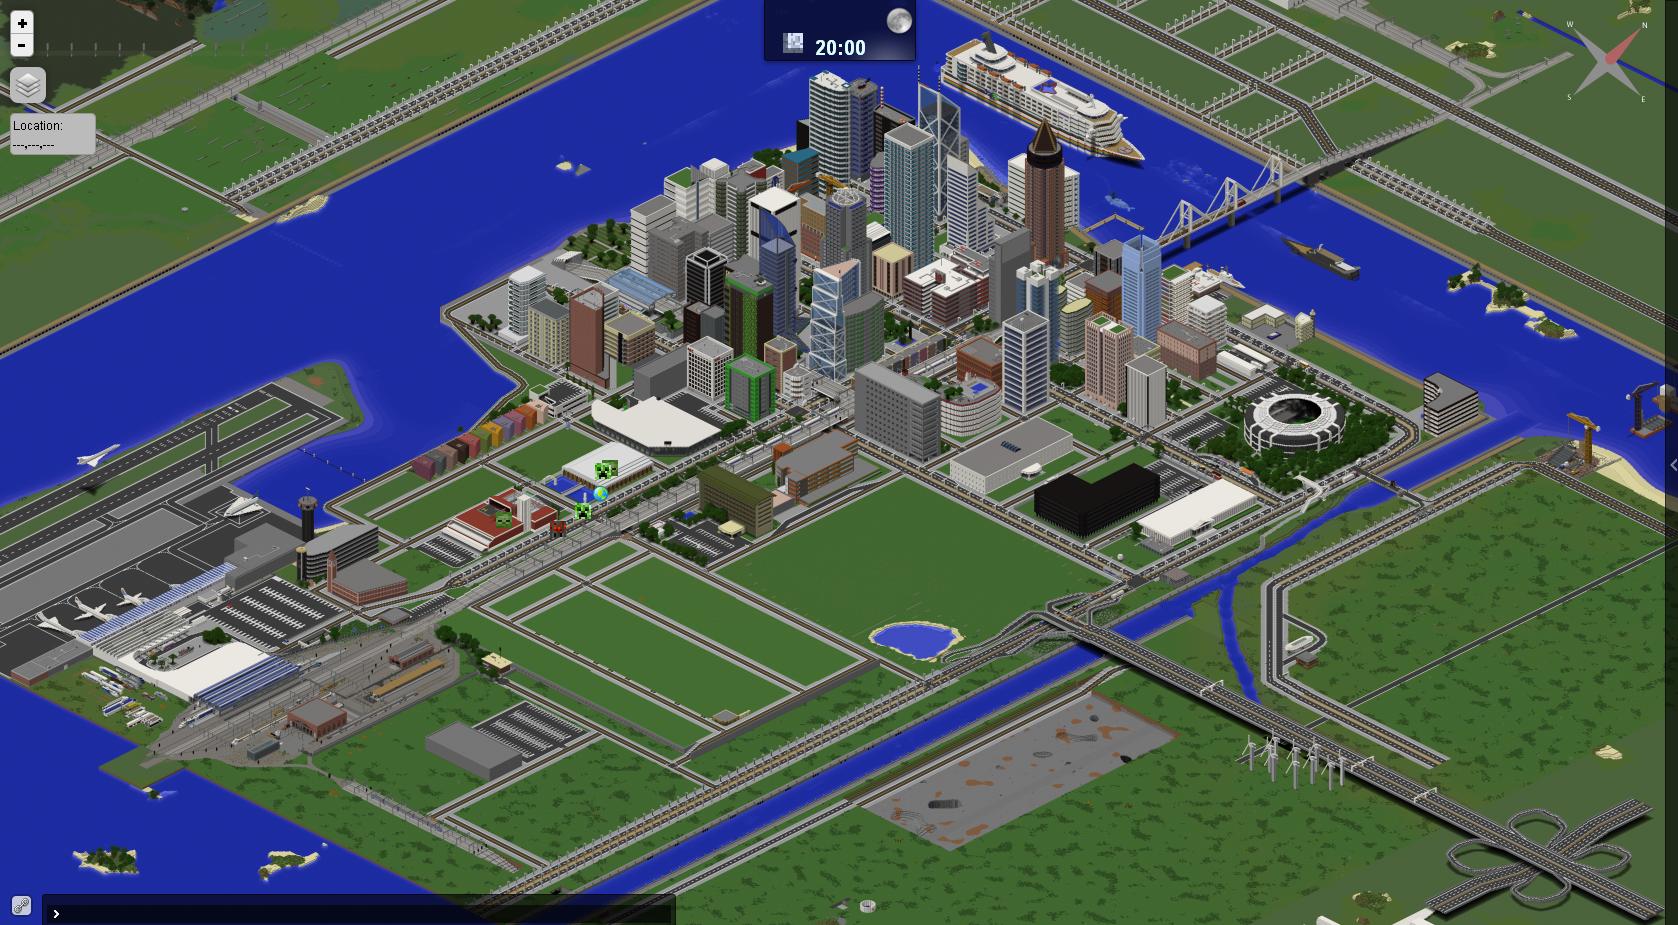 CITY MAP] Waterton | A Modern City [V 0.1.7] 50K+ Downloads! - Maps ...